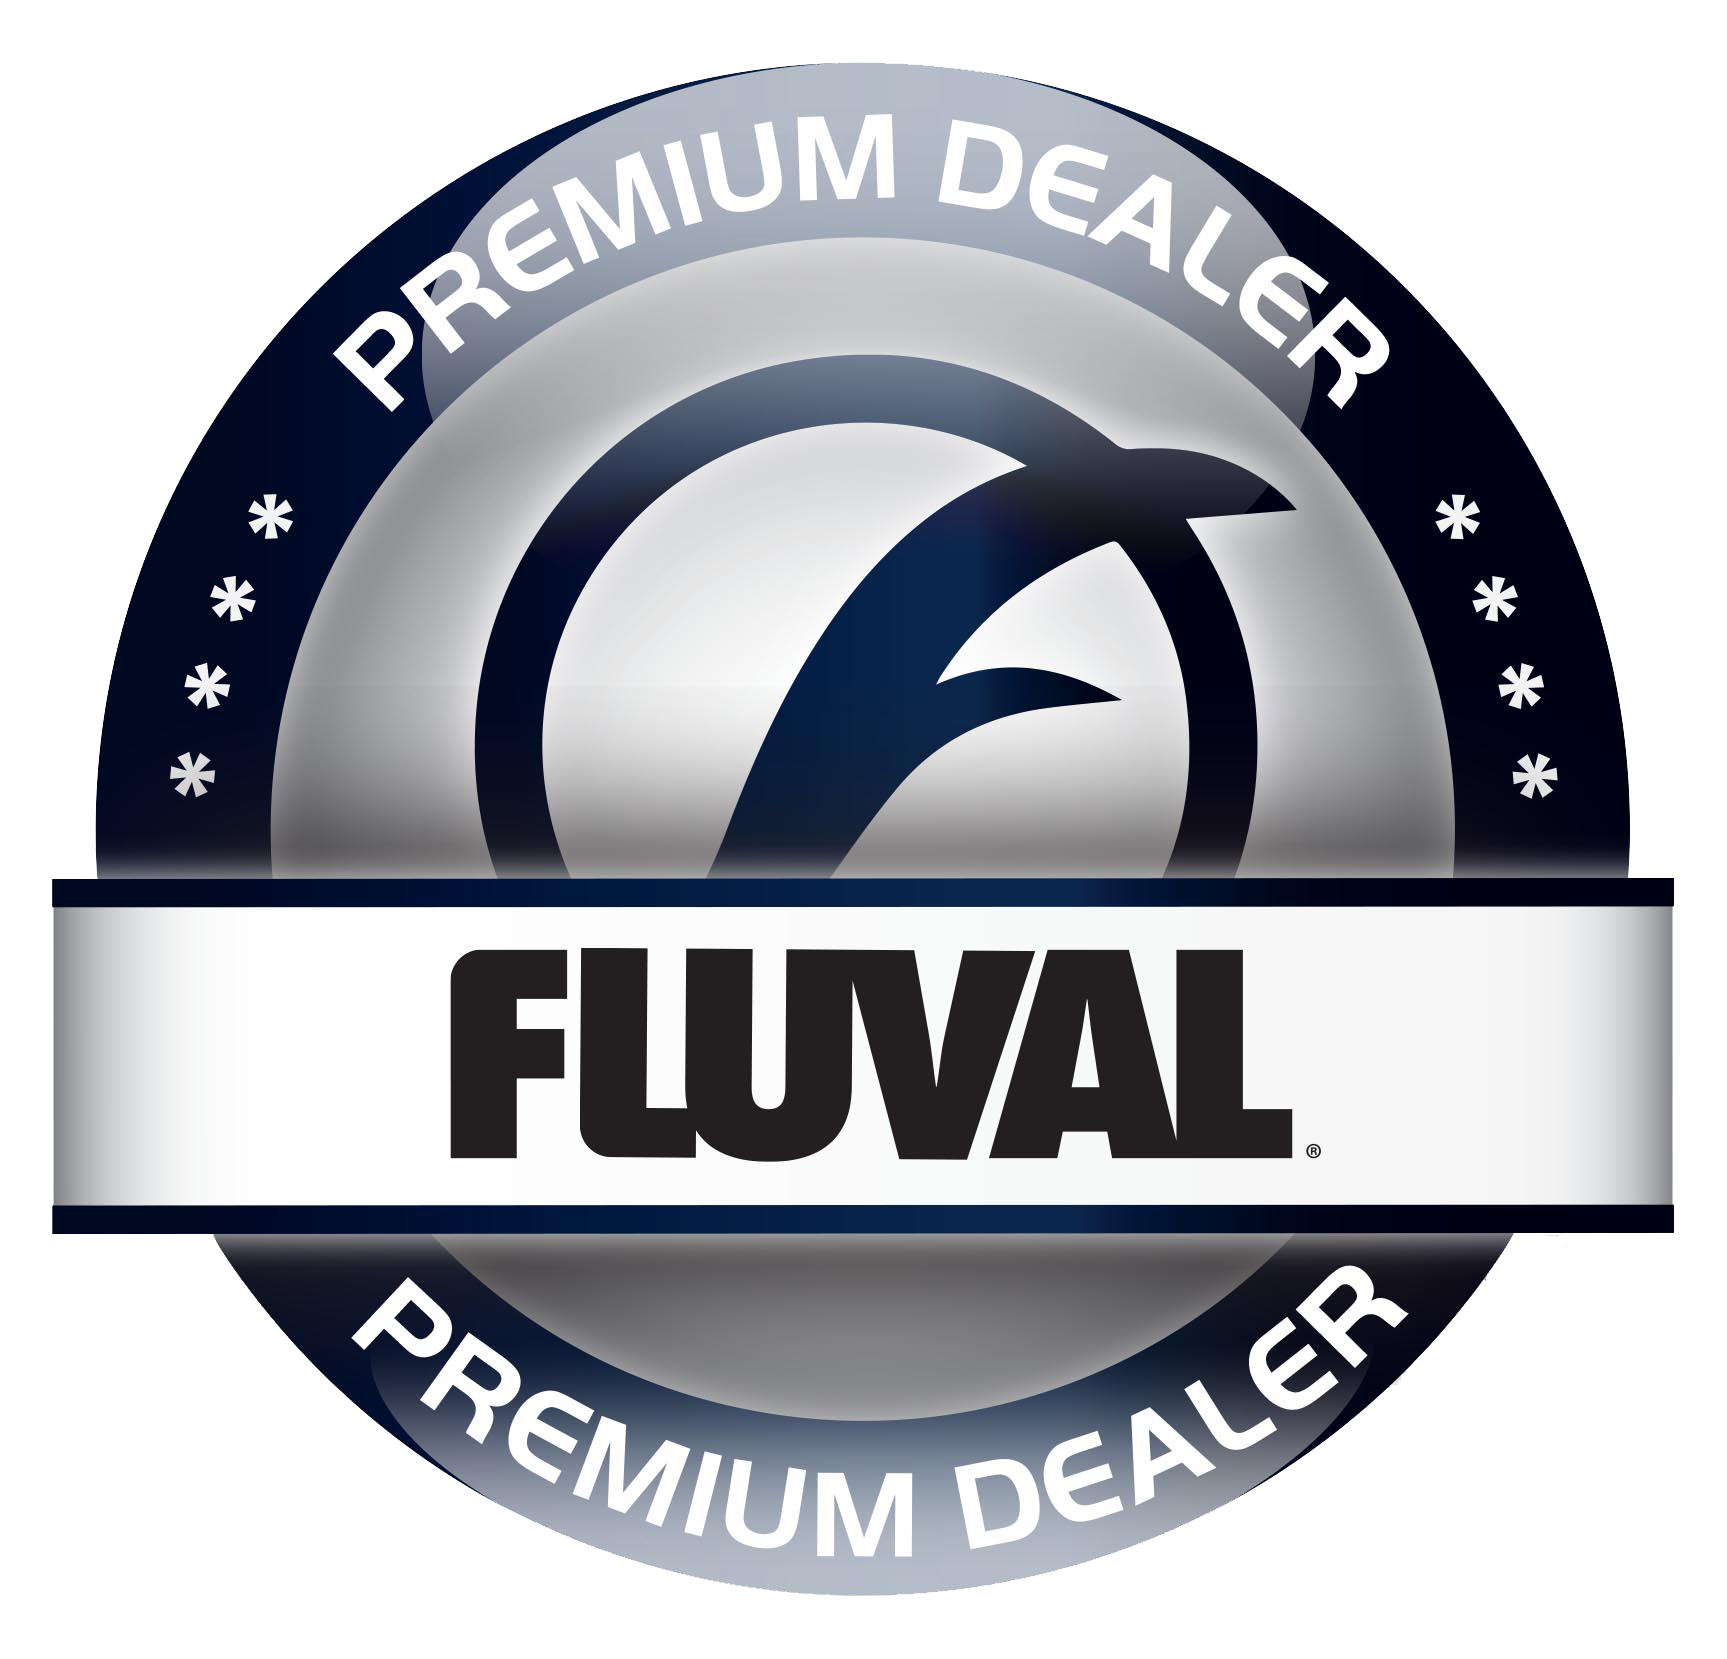 fluval-premium-dealer-logo.png